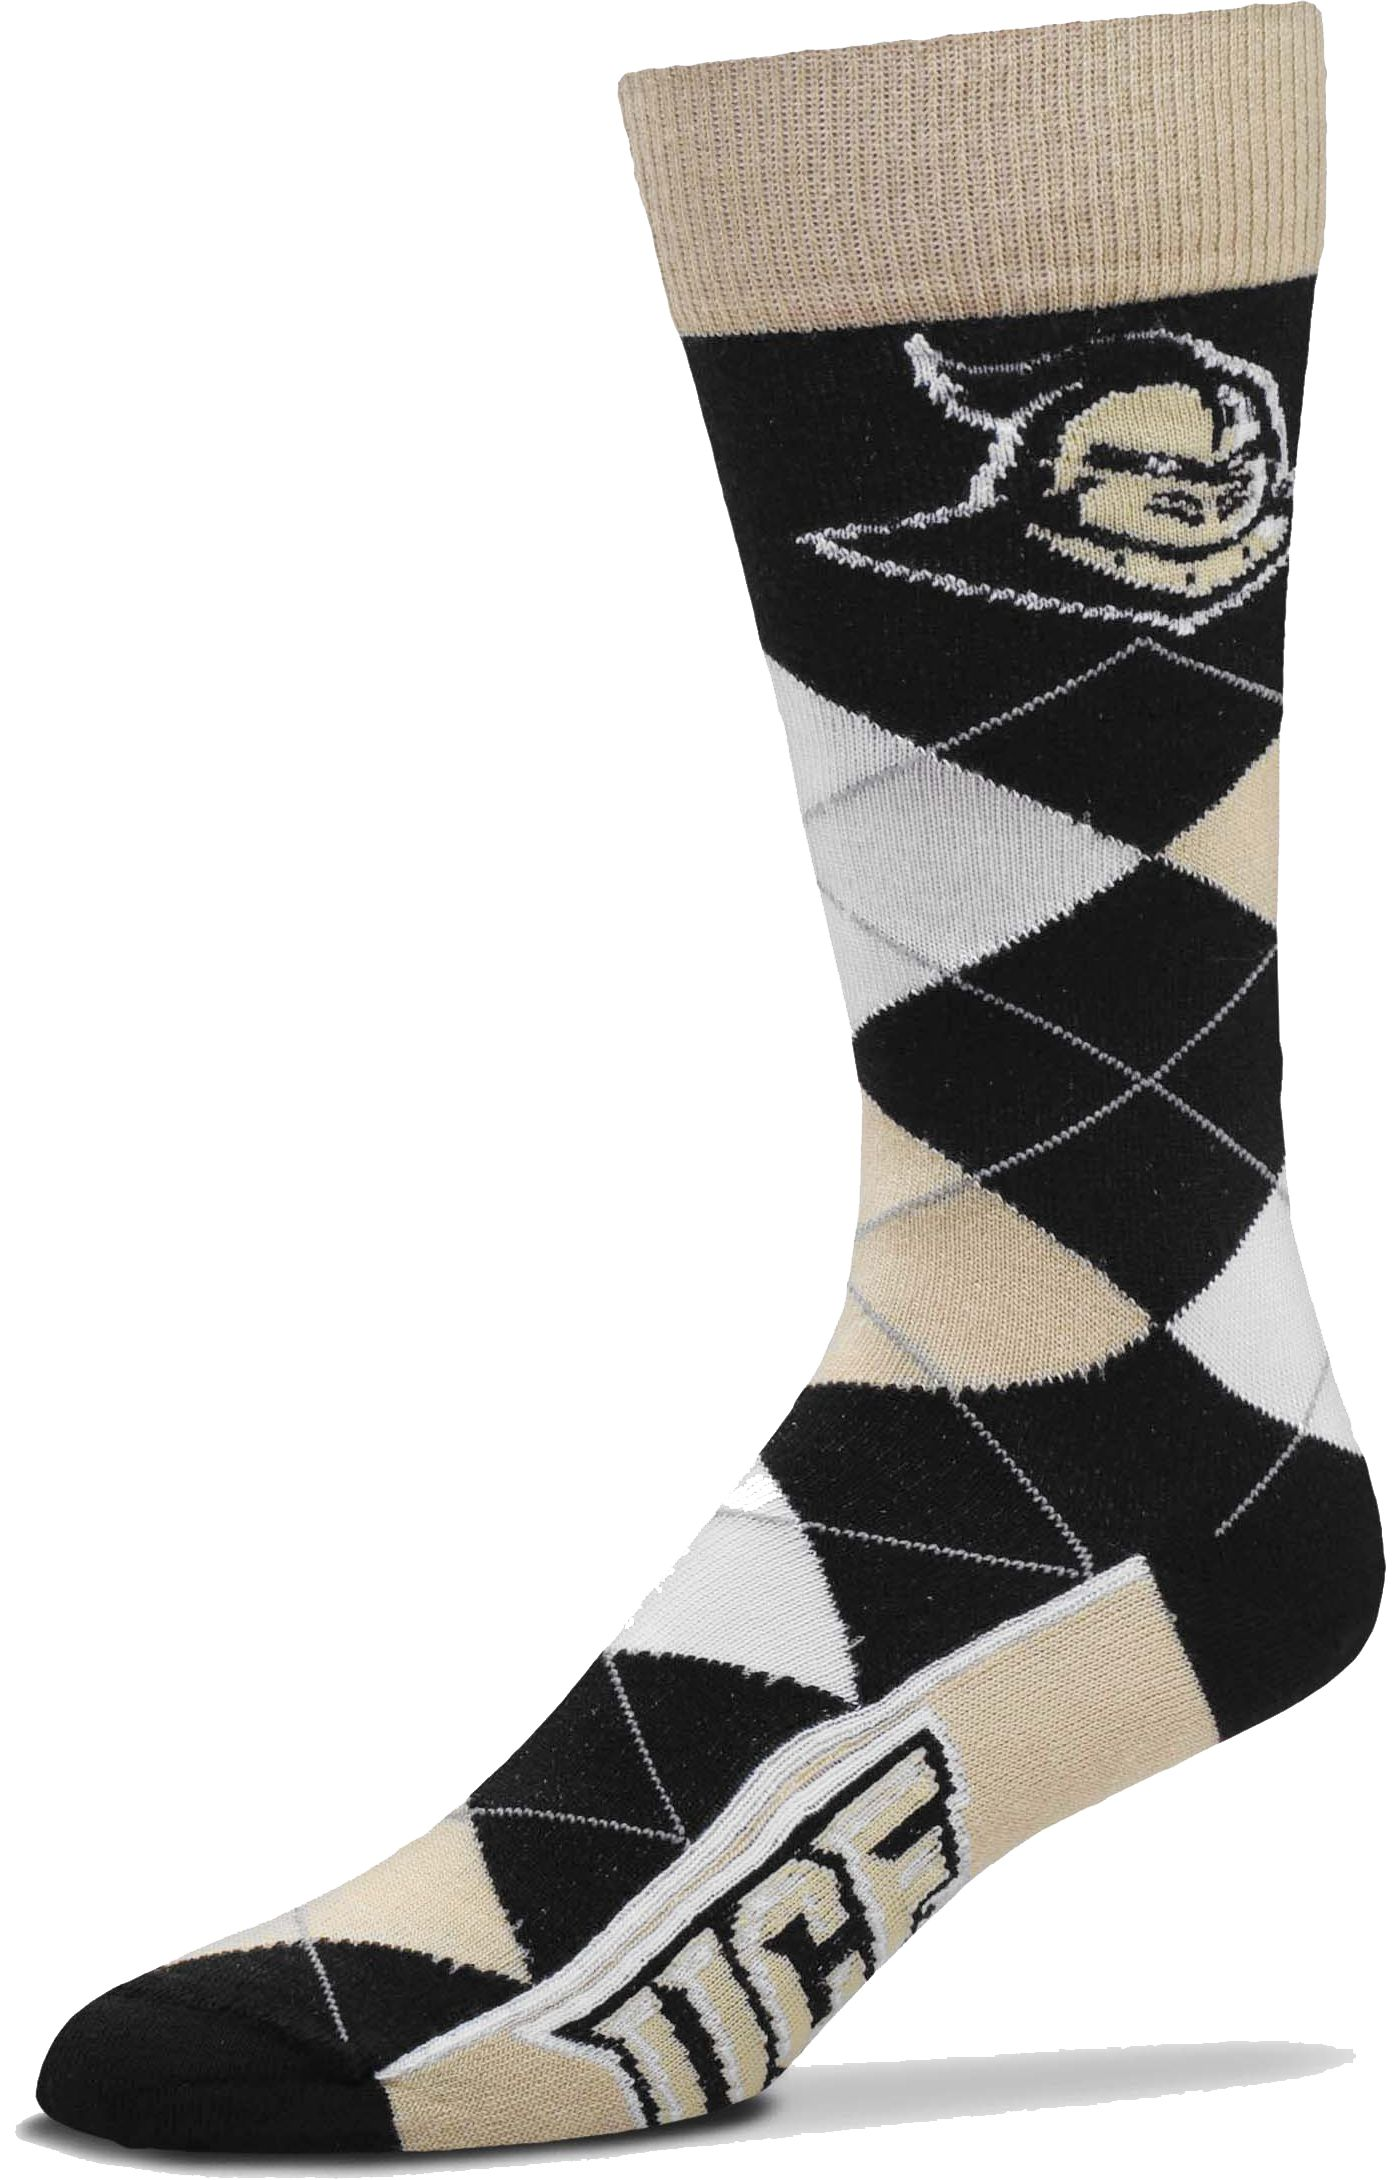 For Bare Feet UCF Knights Argyle Socks